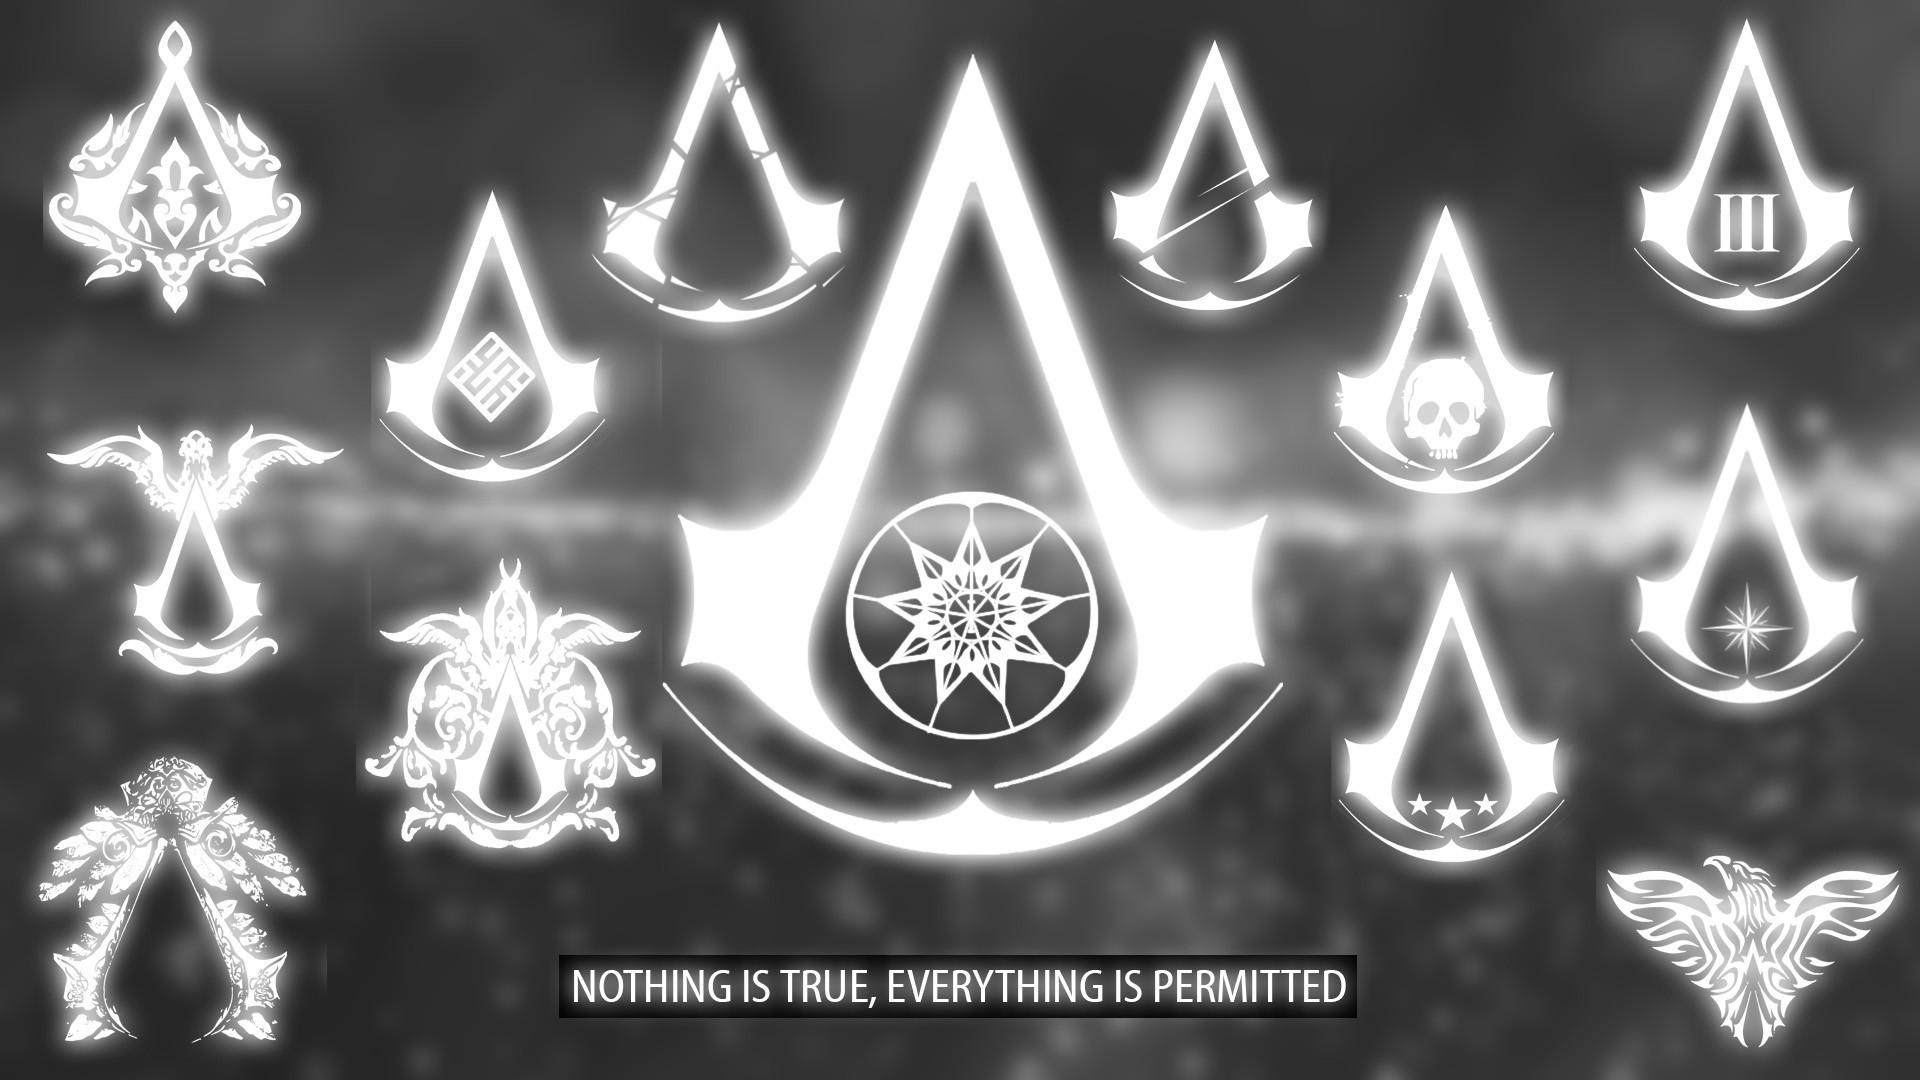 General Assassin's Creed Assassin's Creed II Assassin's Creed:  Brotherhood Assassin's Creed: Revelations Assassin's